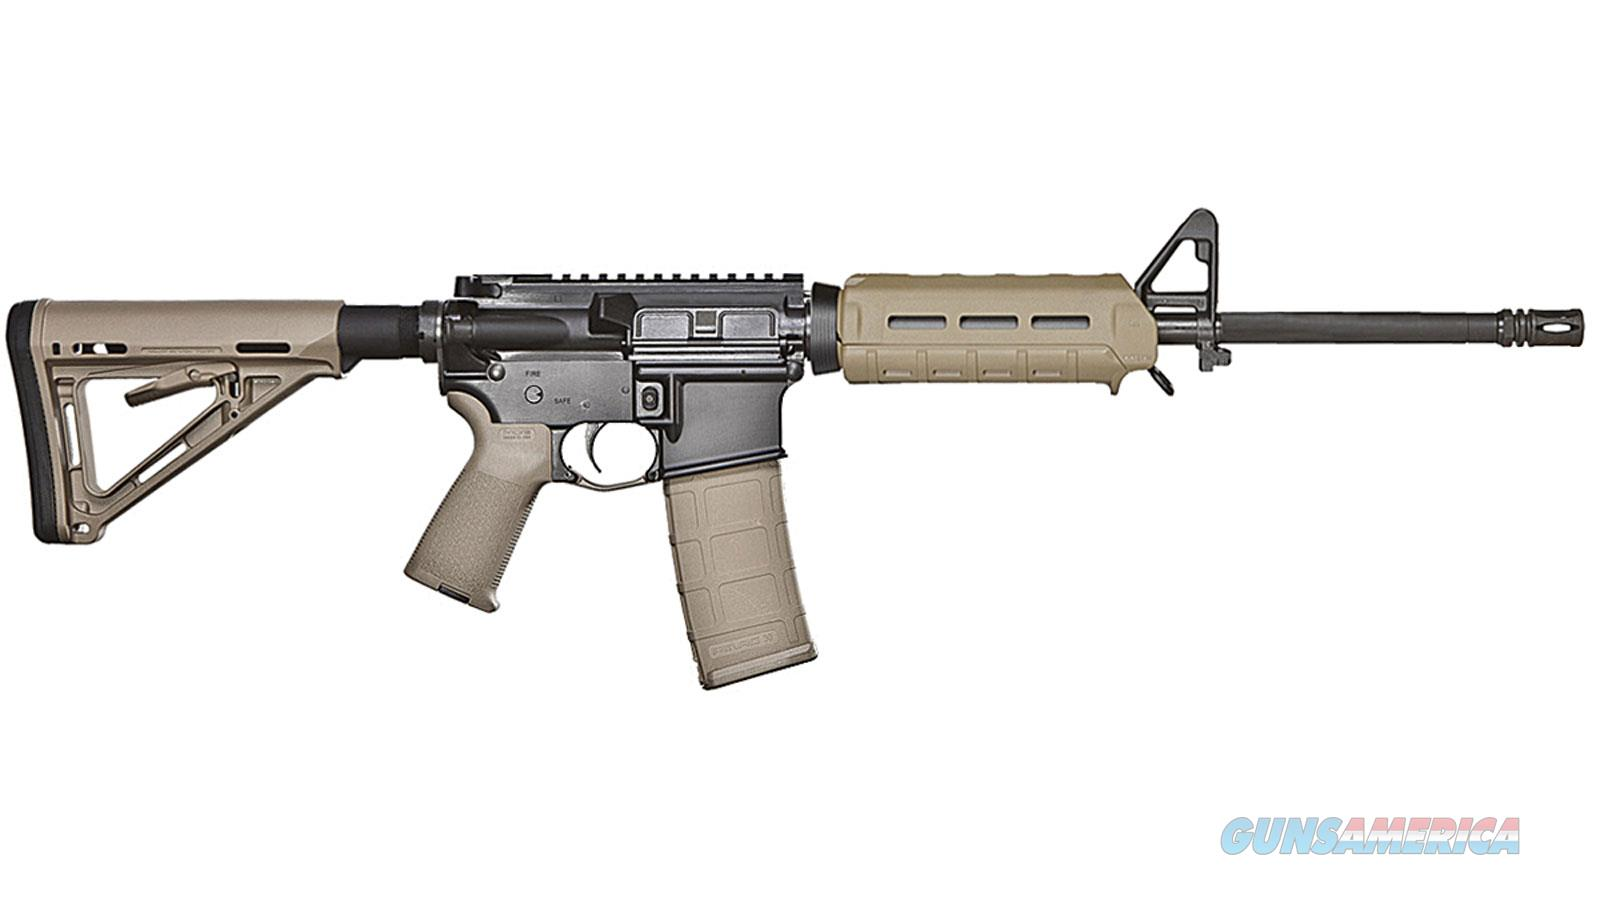 Delton Sierra 316 Semi-Auto Rifle 223 Rem, Rh, 16 In, Blk, Plmr Stock, 30+1 Rnd, Std Trgr RFTMH16-MLOKDE  Guns > Rifles > D Misc Rifles